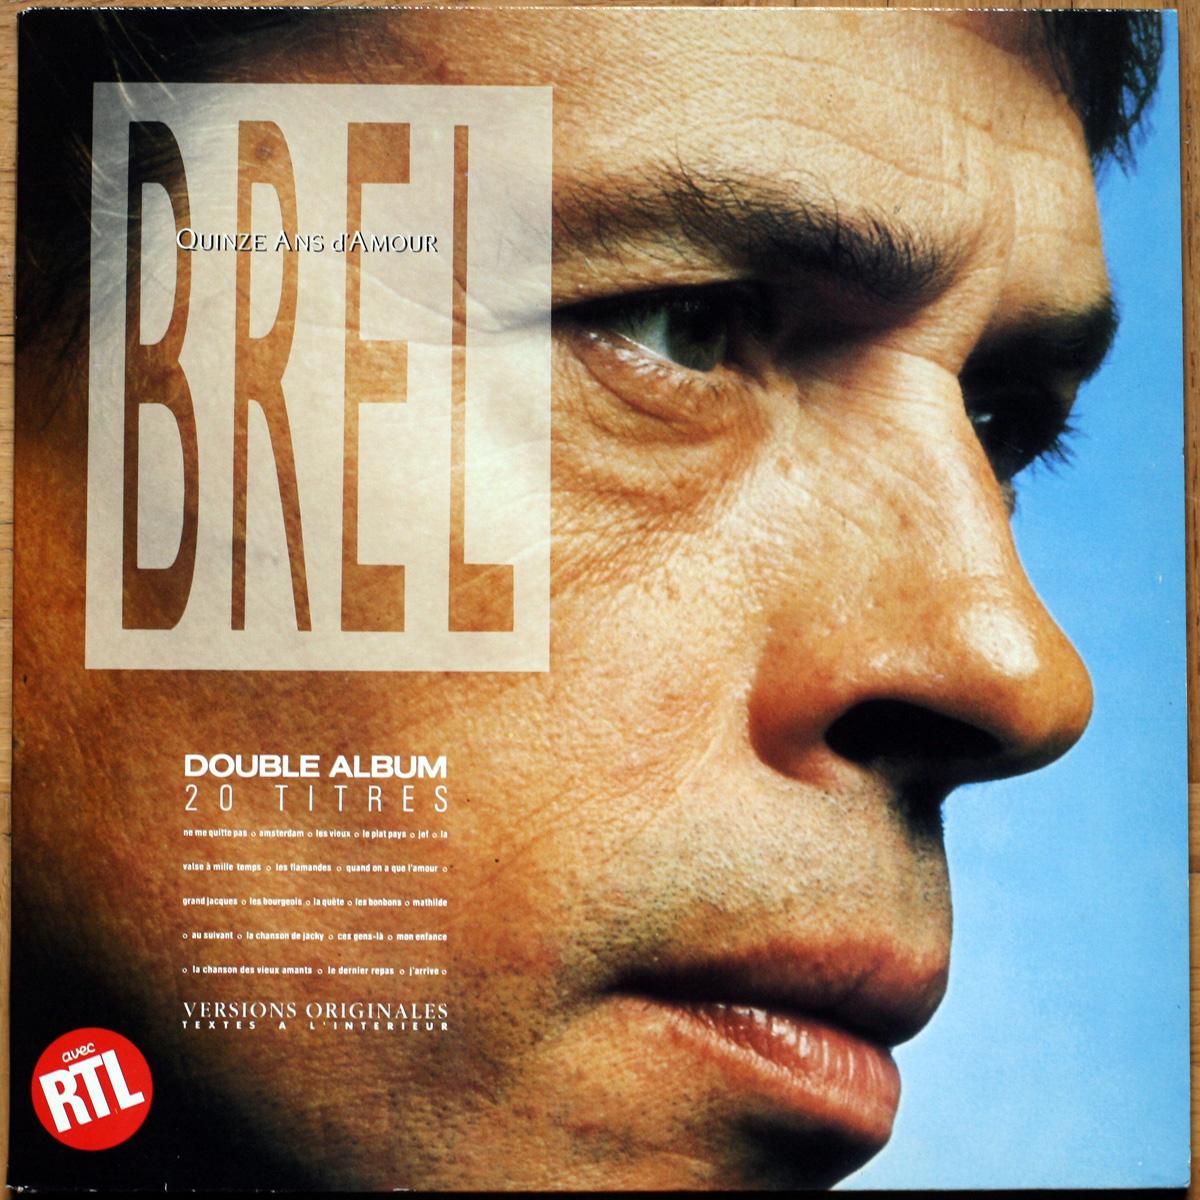 Brel Compilation